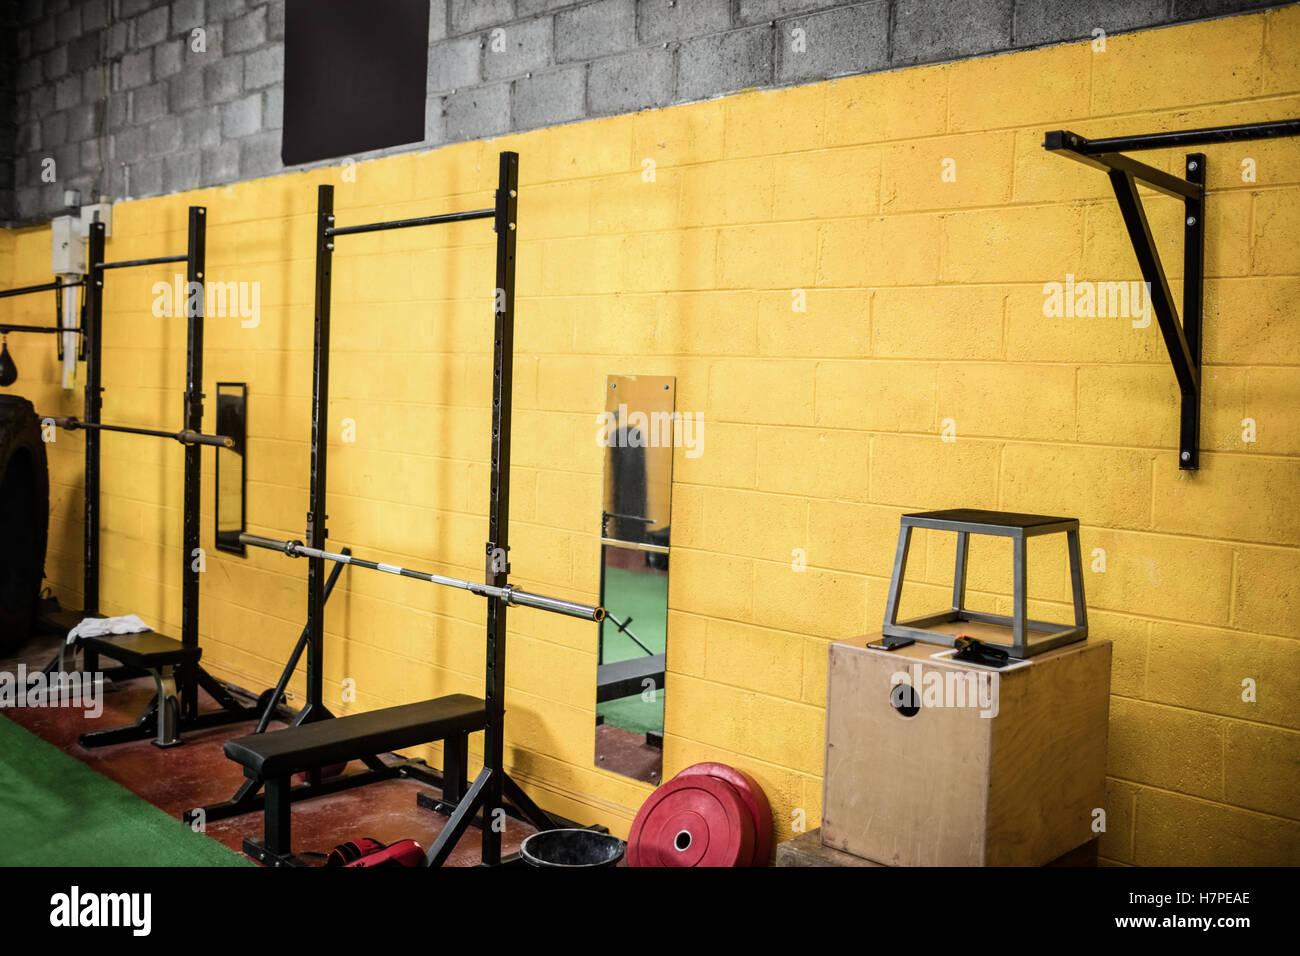 Exercising equipment in the fitness studio - Stock Image